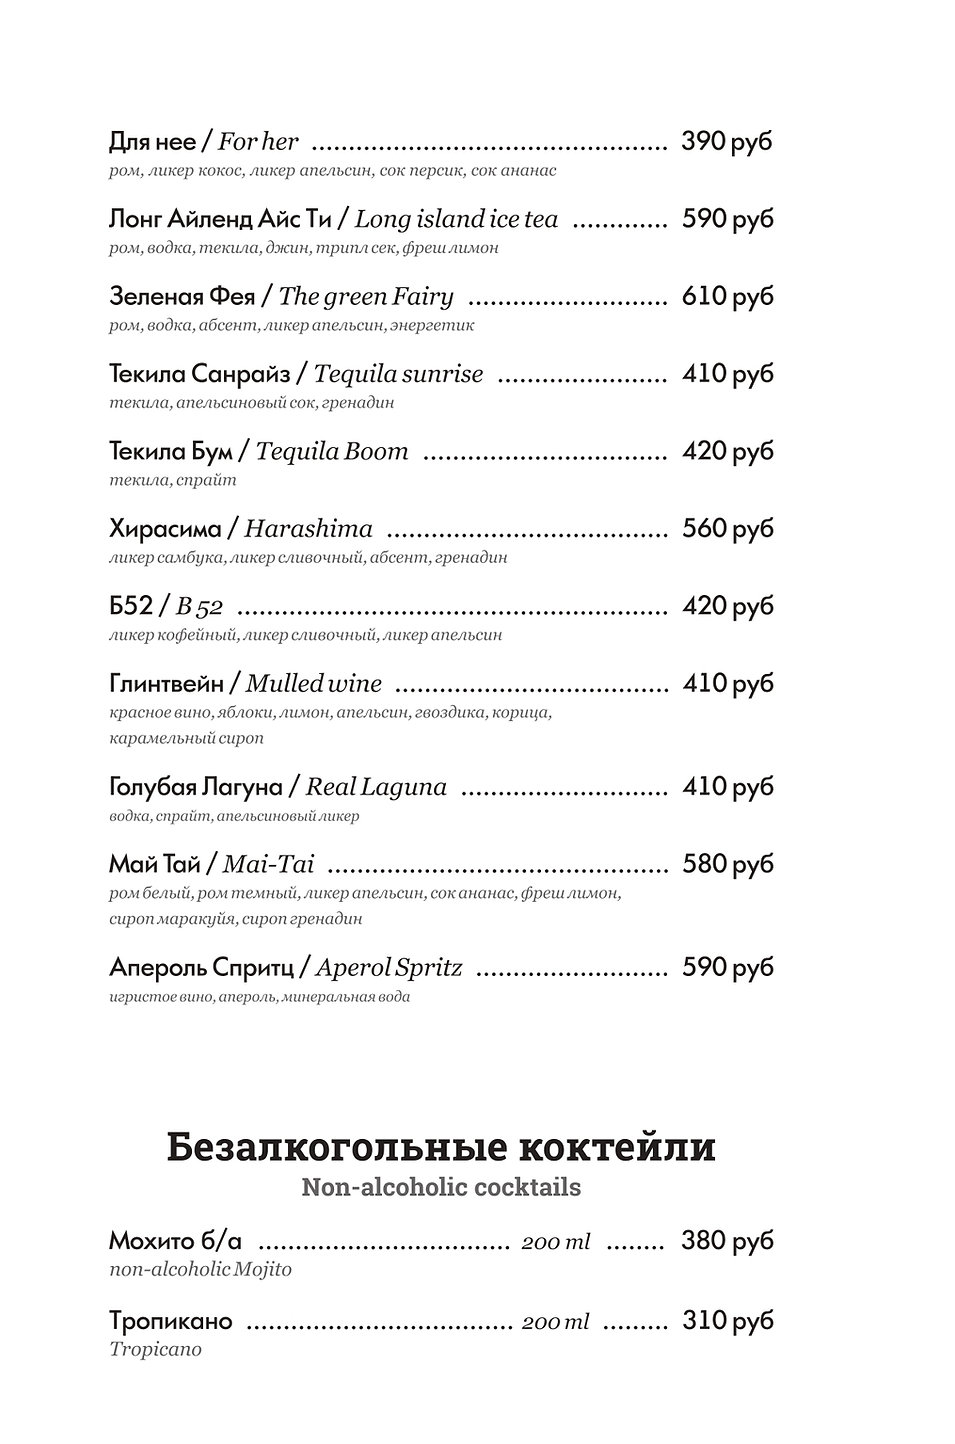 S46_bar_2021_ (2)_page-0008.jpg